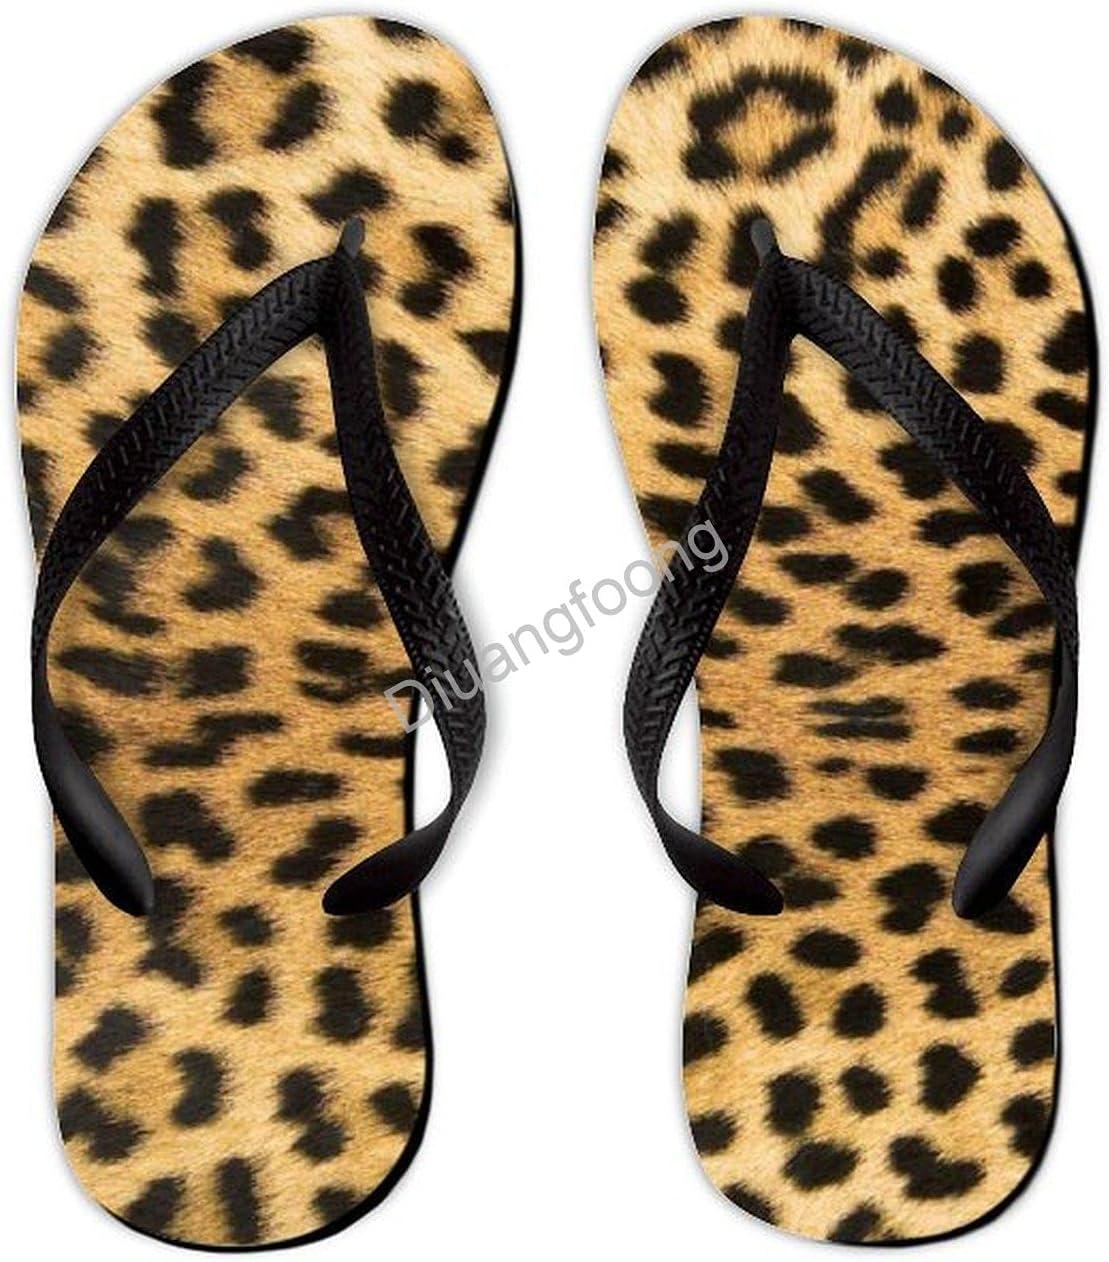 Leopard Flip Flop Beach Colorful Thong Sandals Eva Sandal For Party Bathroom Travel Black Style7